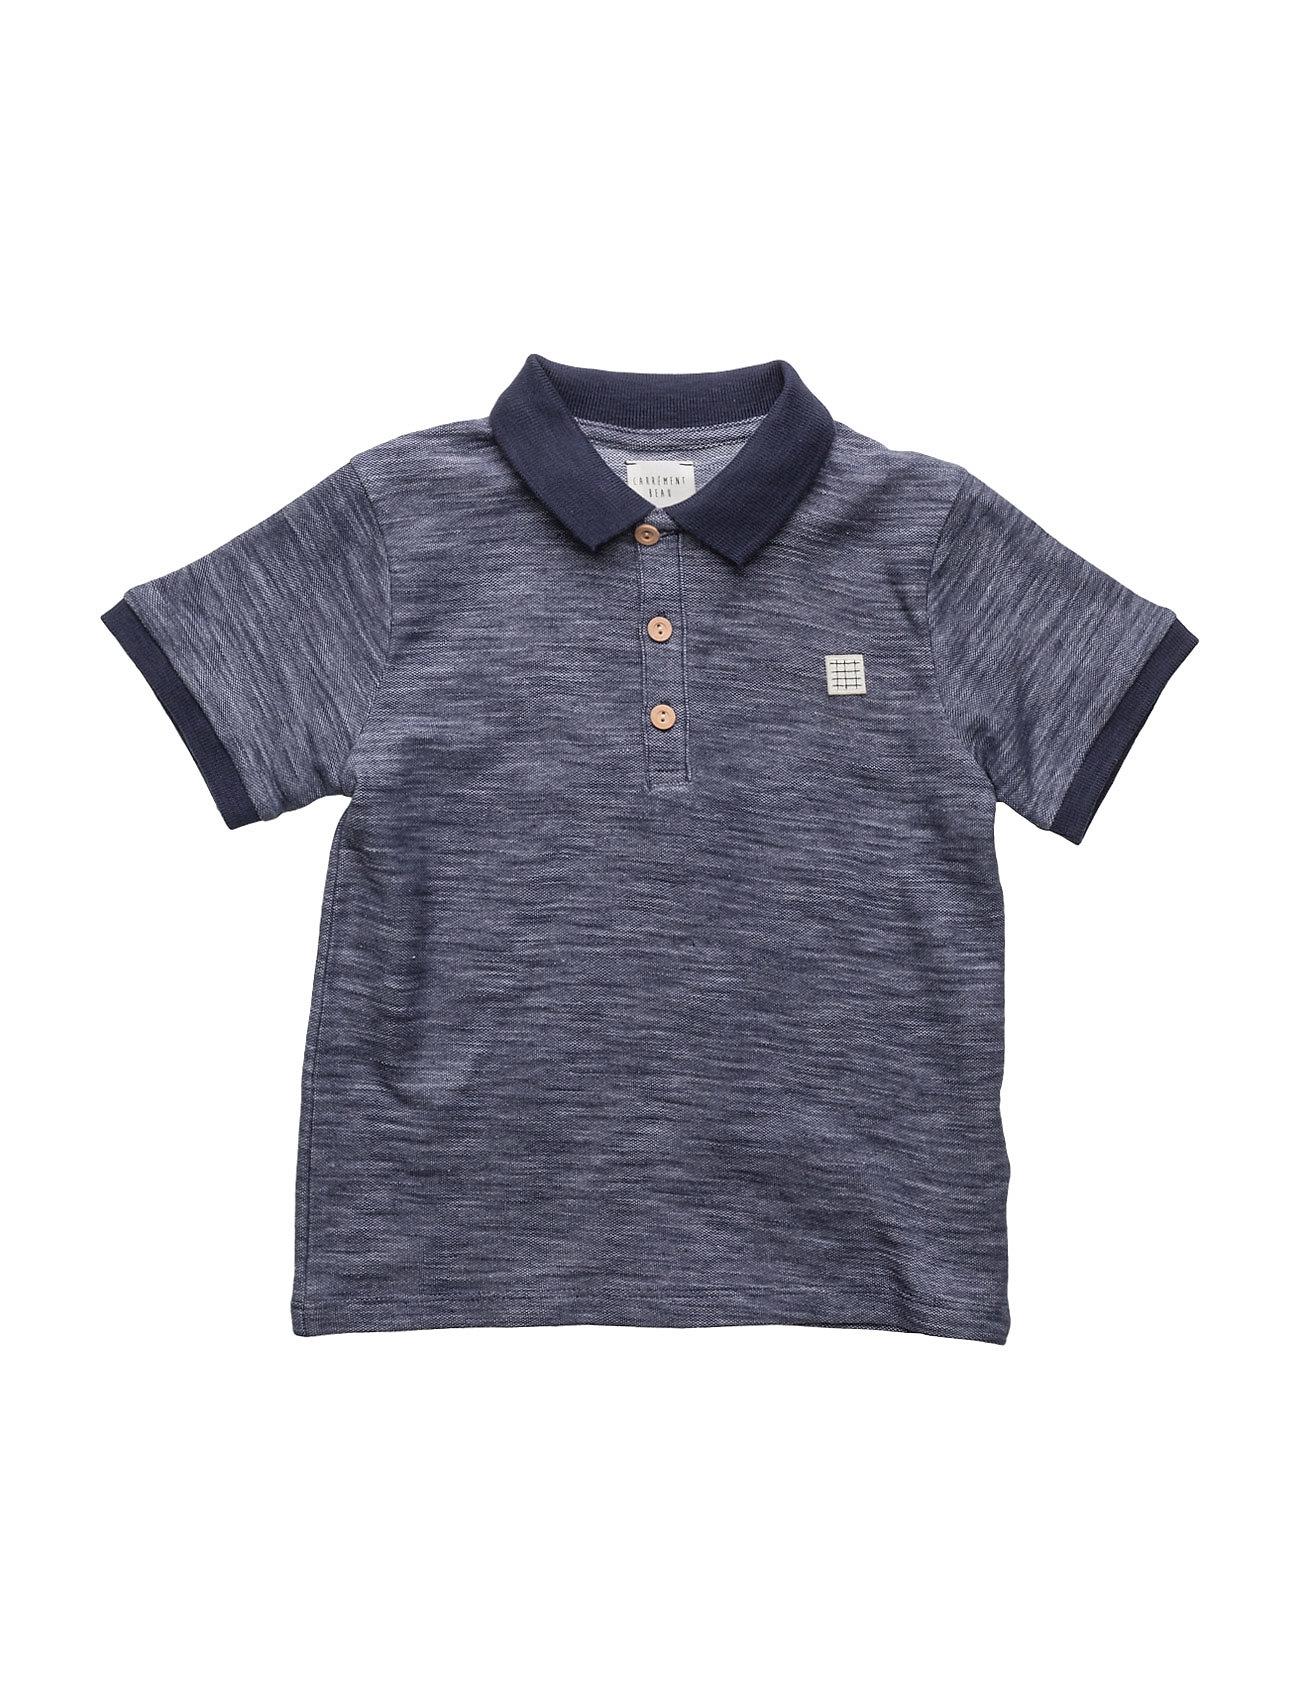 carrã©ment beau – Polo shirt på boozt.com dk